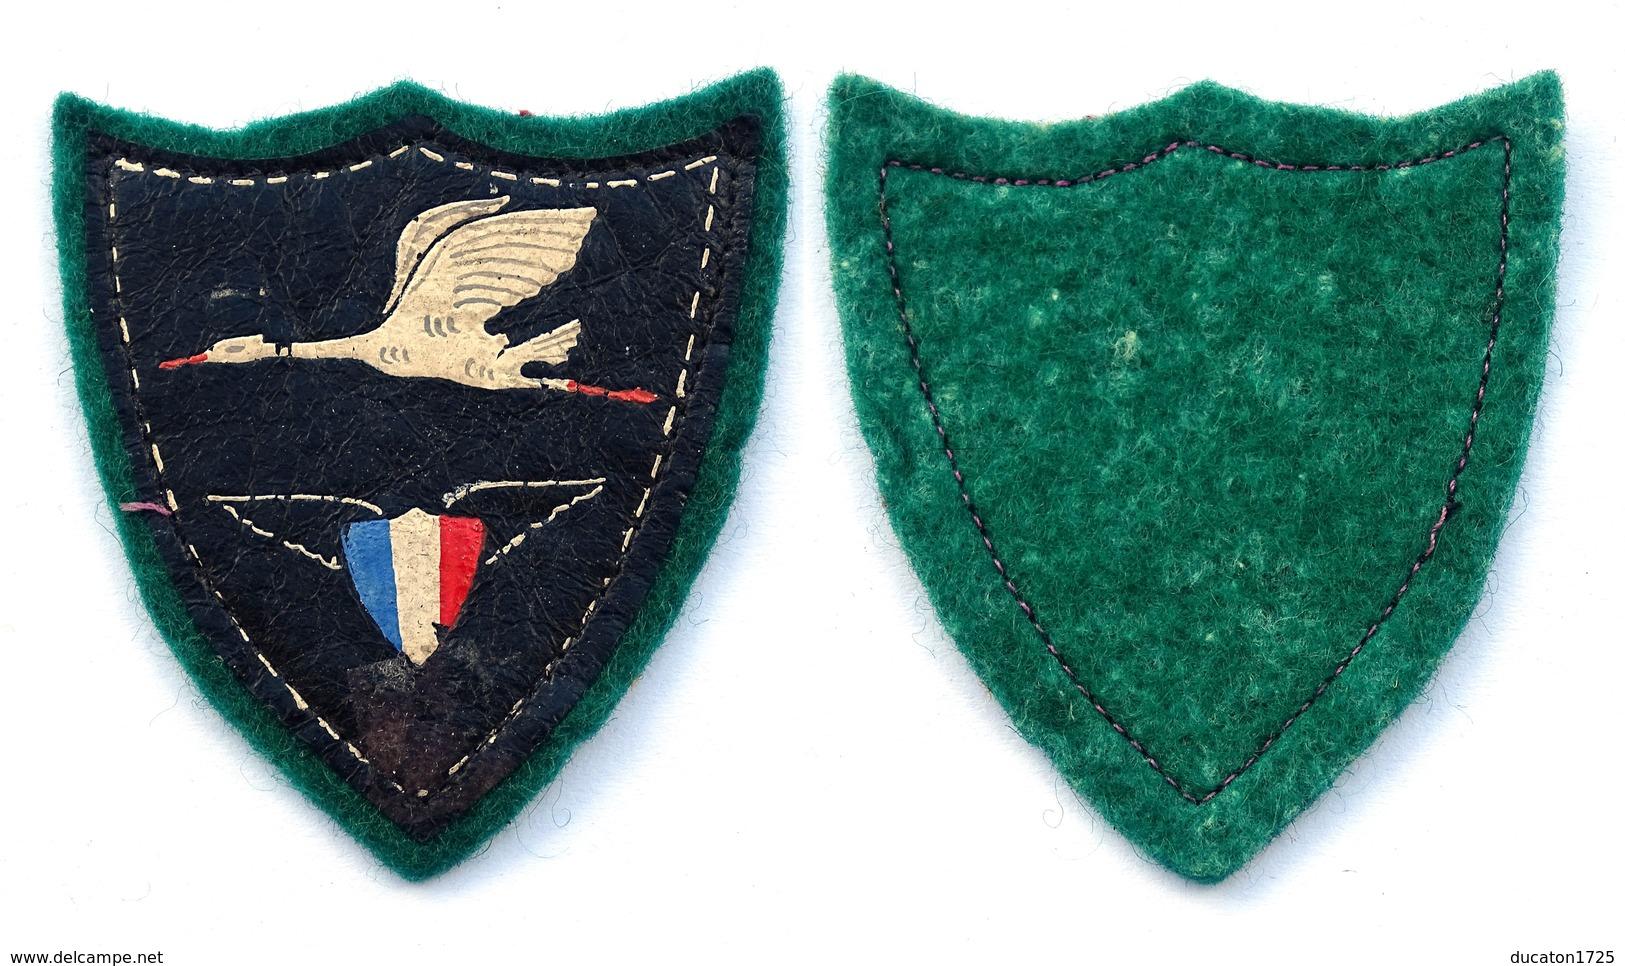 Insigne-Tissu Patriotique D'Aviation Période Vichy. Marechal Petain 1940-1944. - Badges & Ribbons